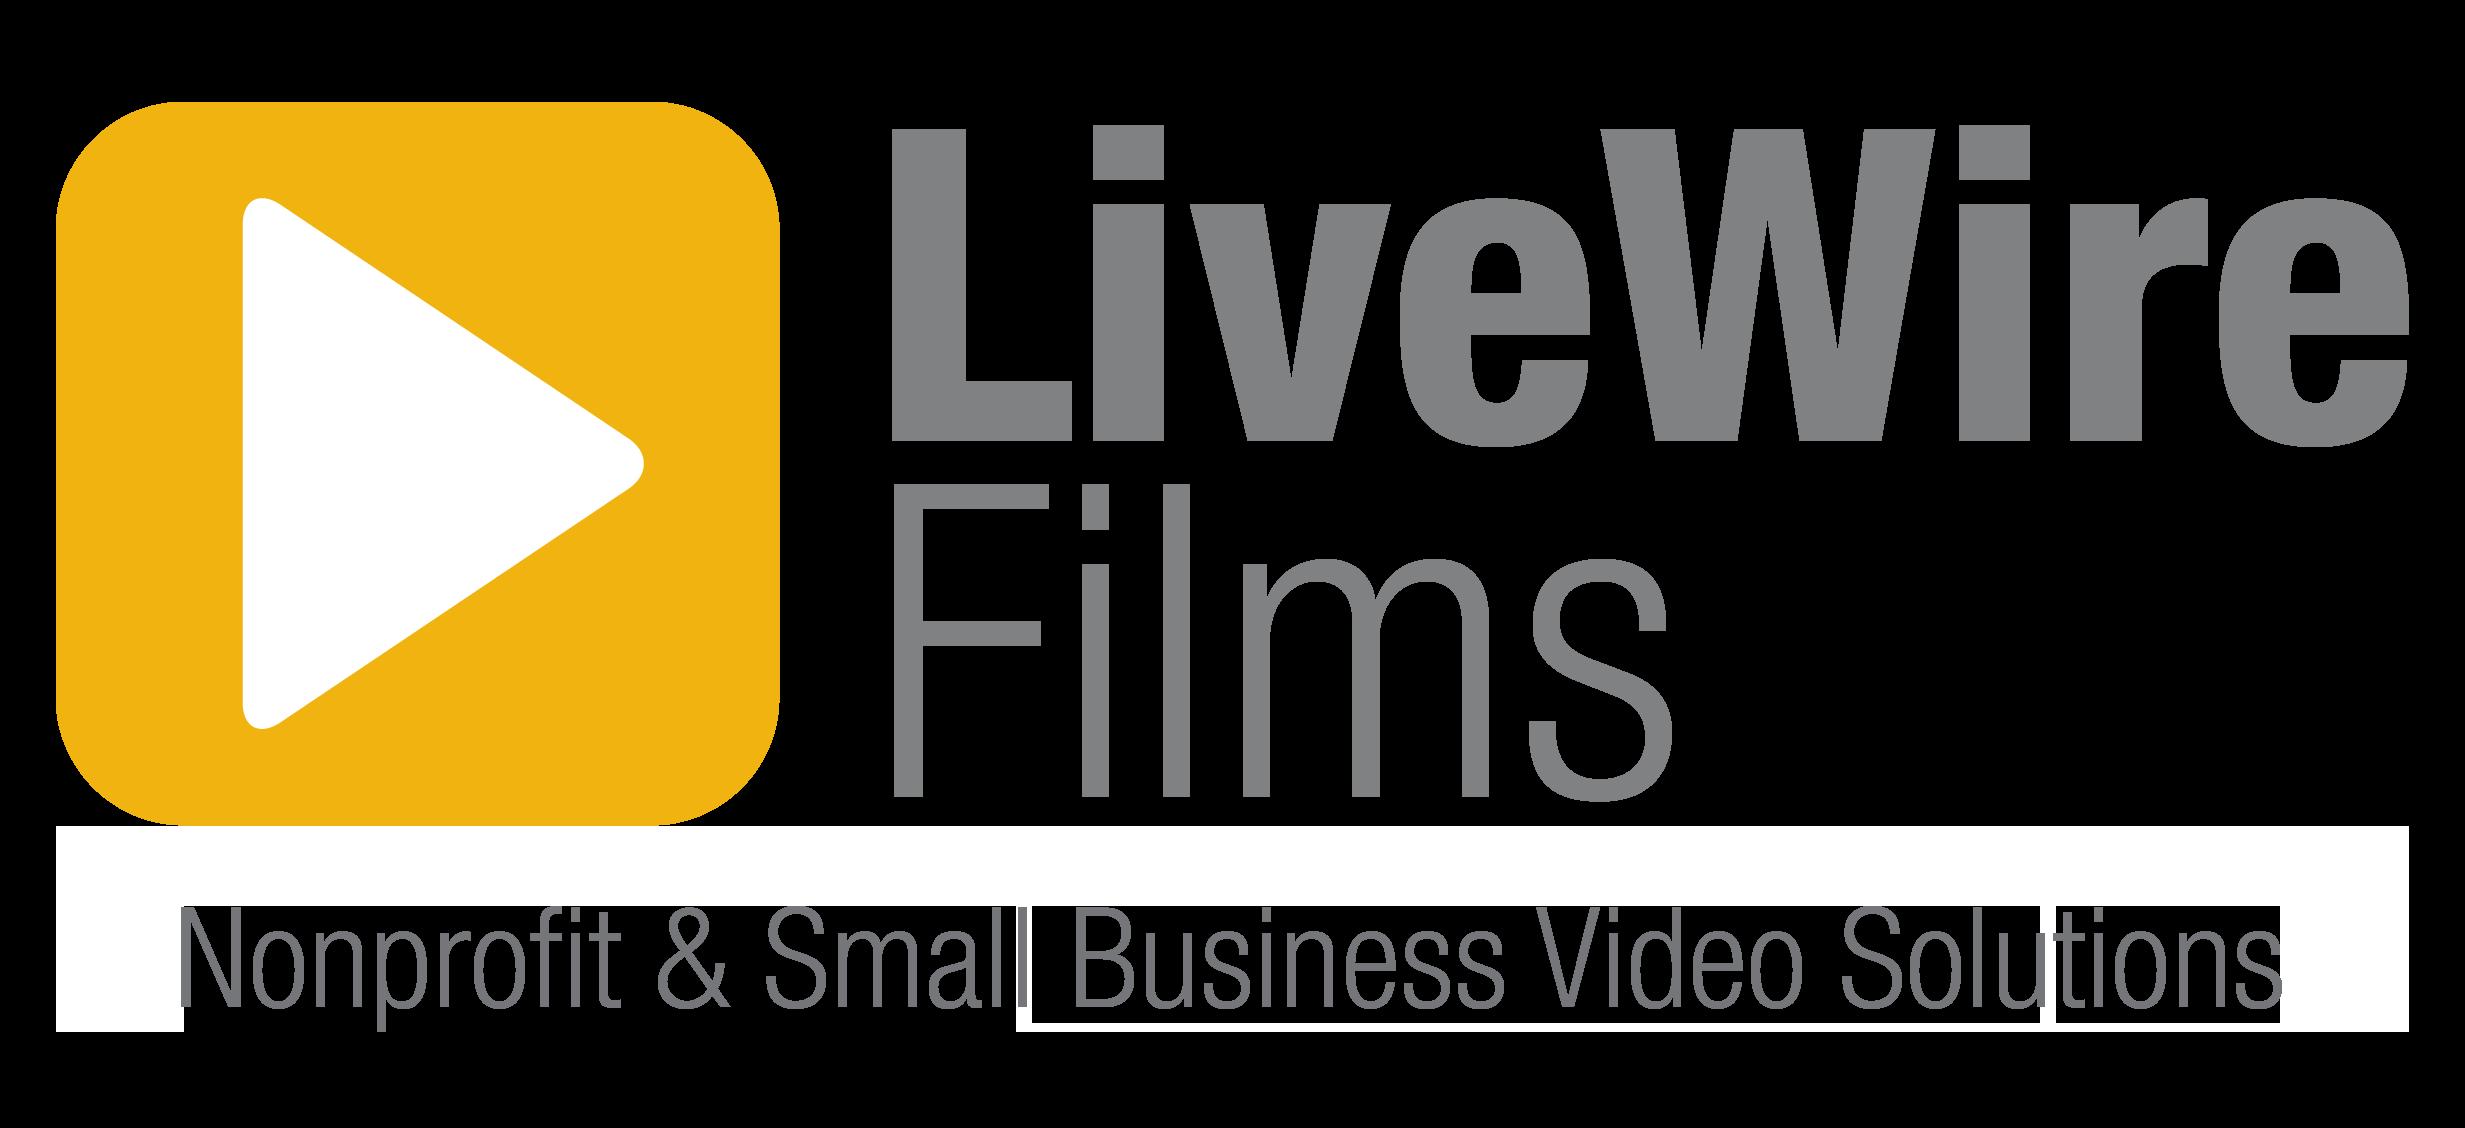 LiveWire Films